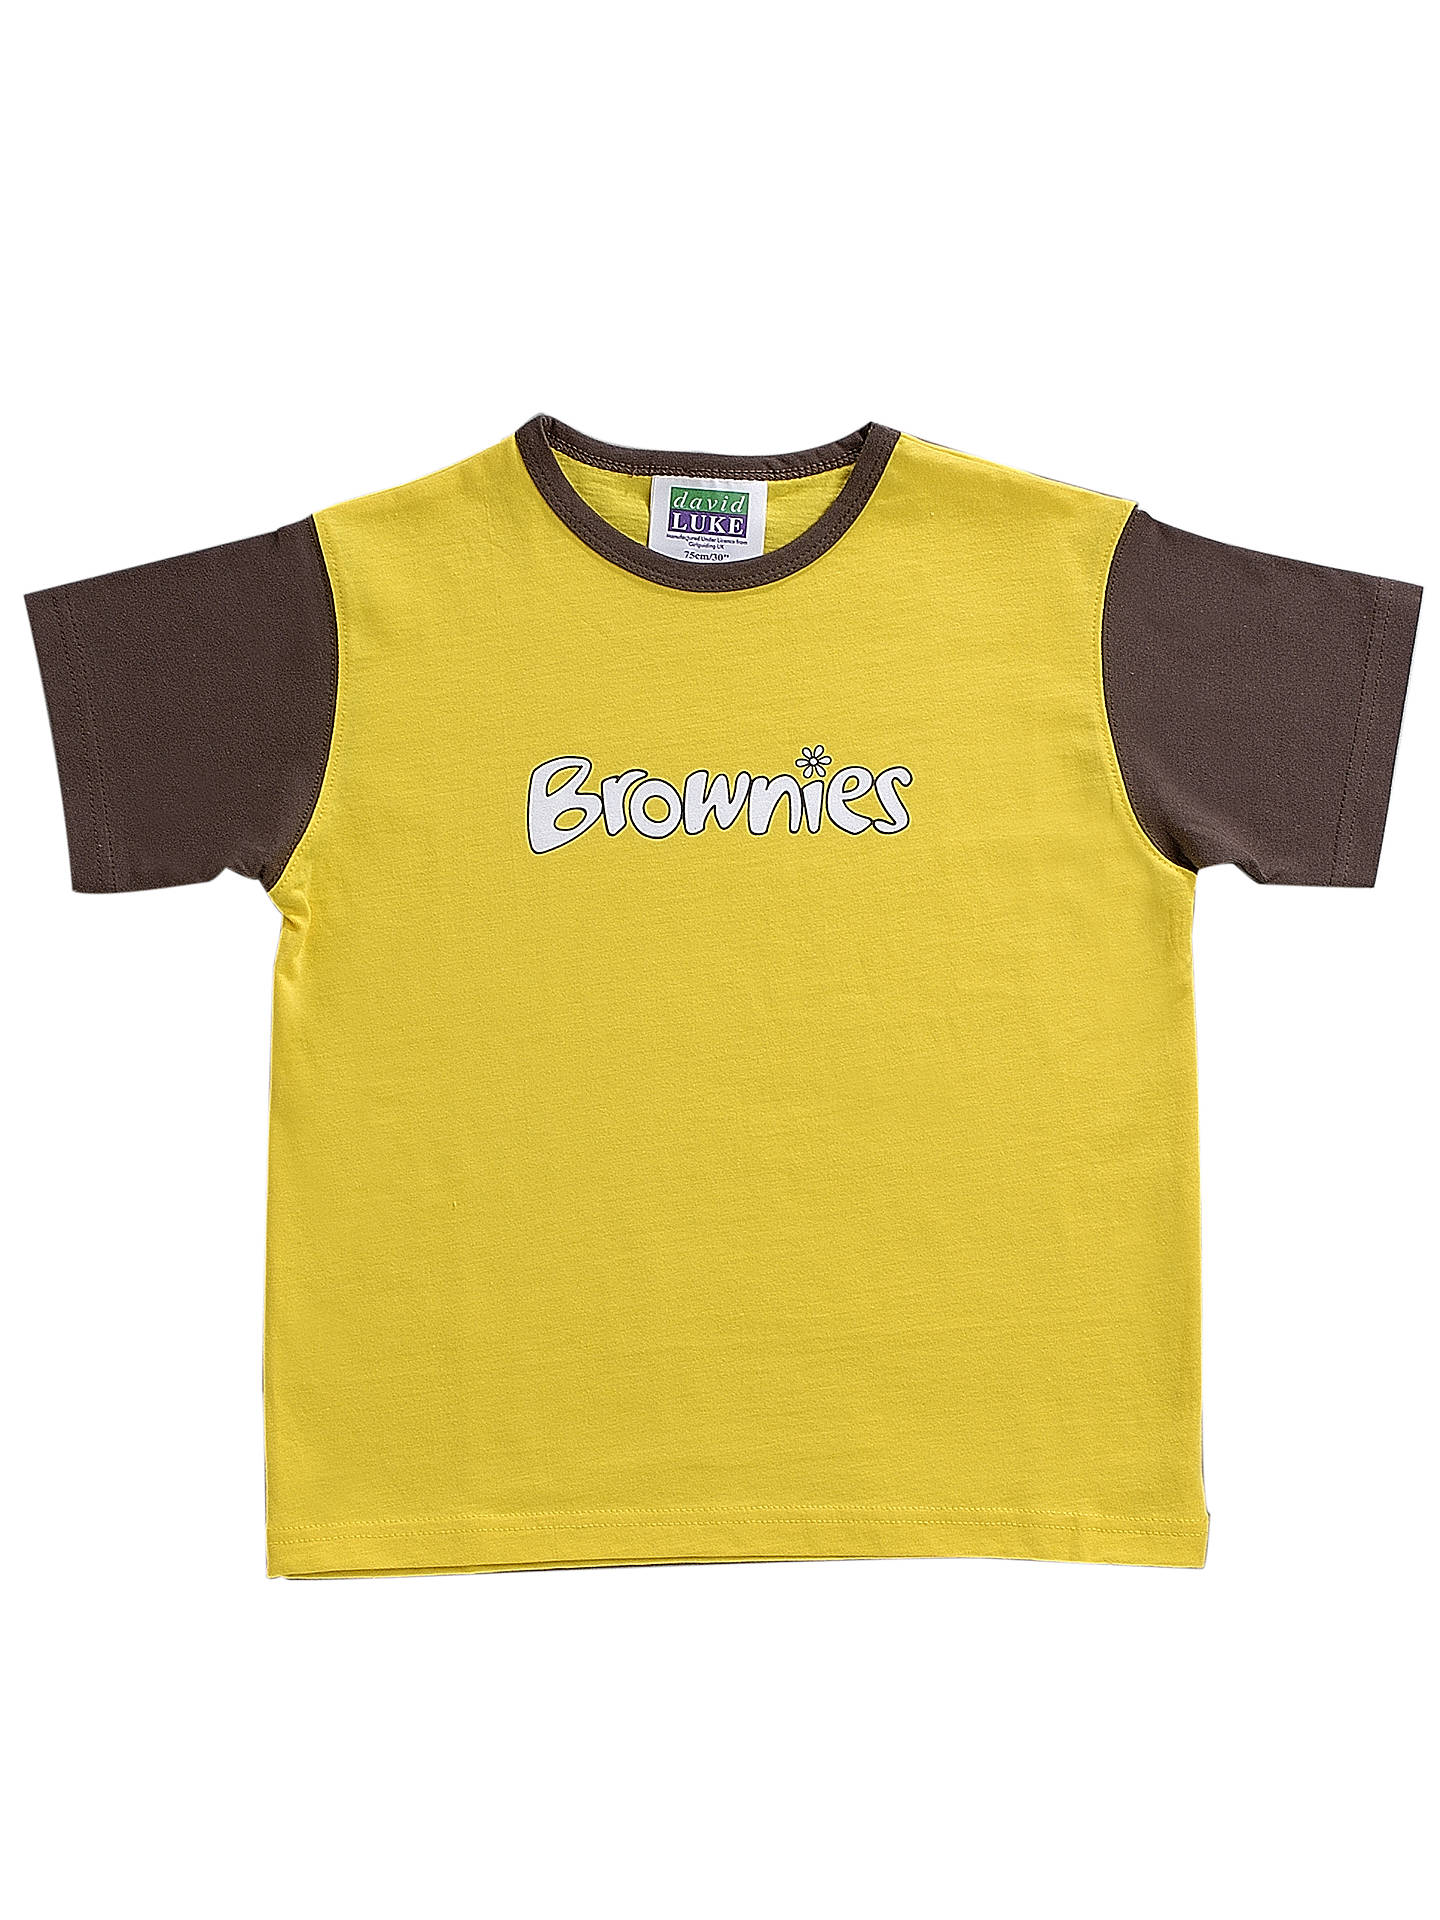 92ed4544ffec1 Brownies Uniform Short Sleeve T-shirt, Yellow/Brown